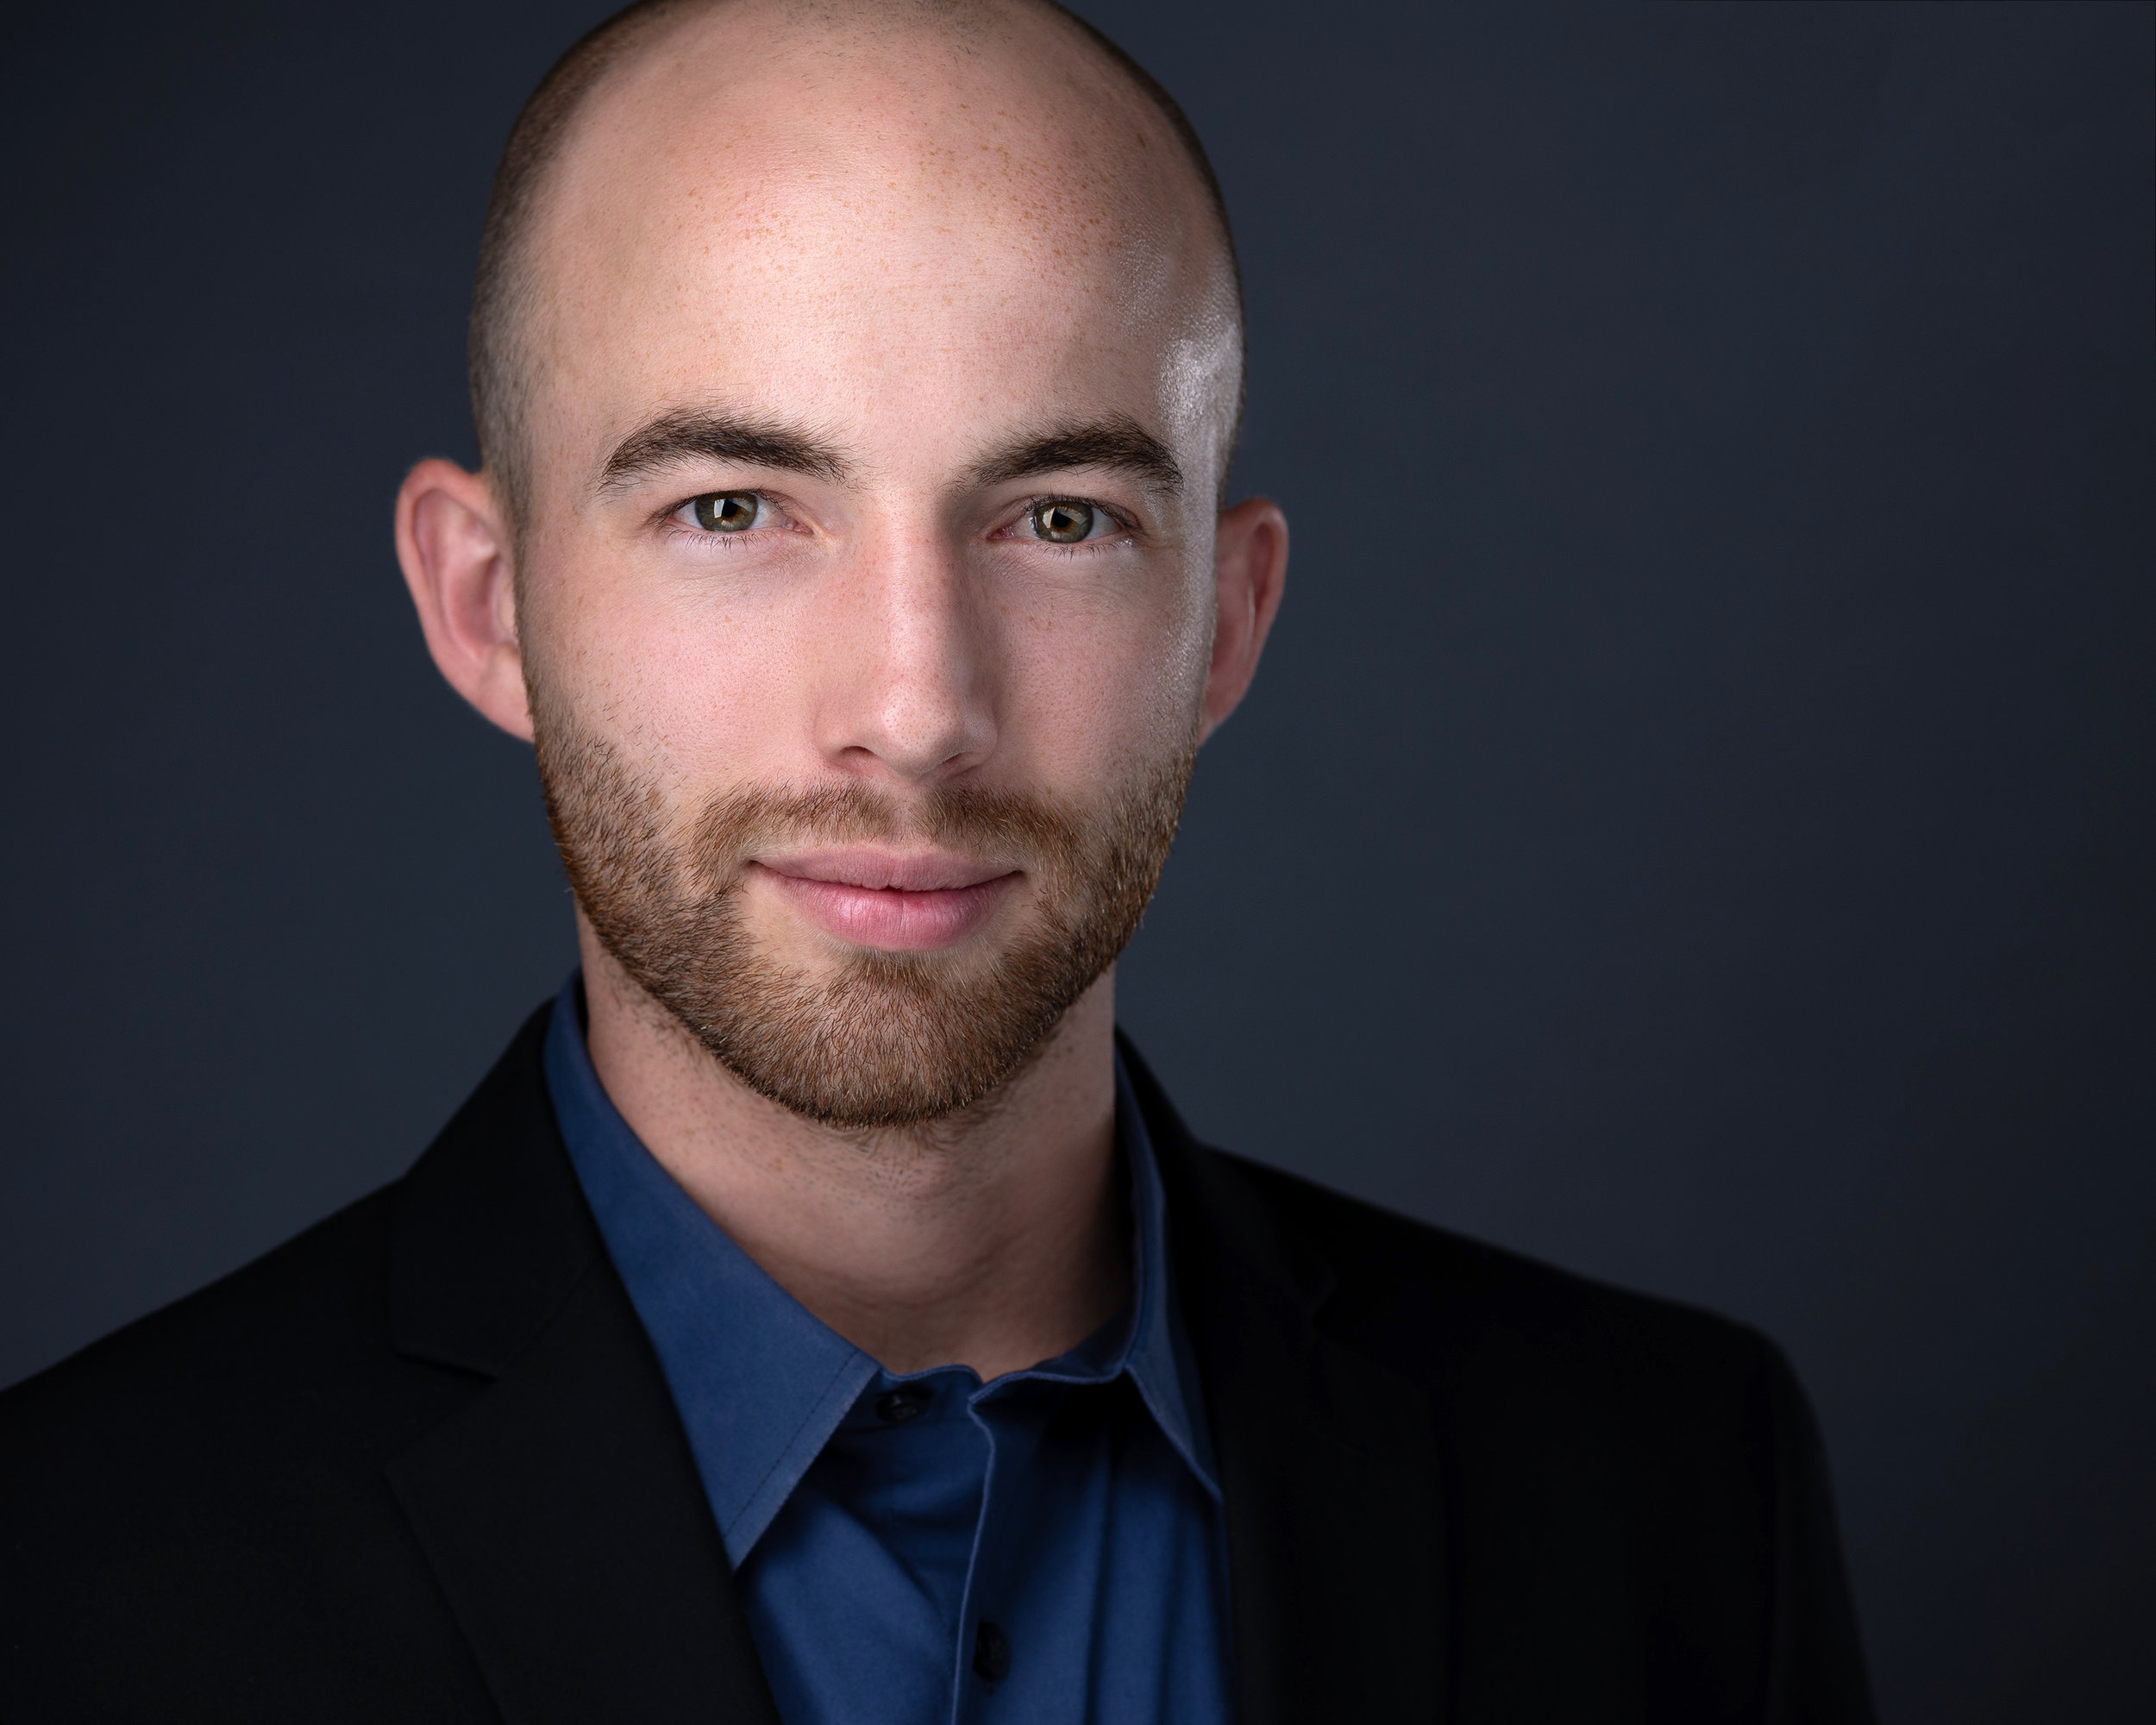 Orange County Headshot and Portrait Photographer